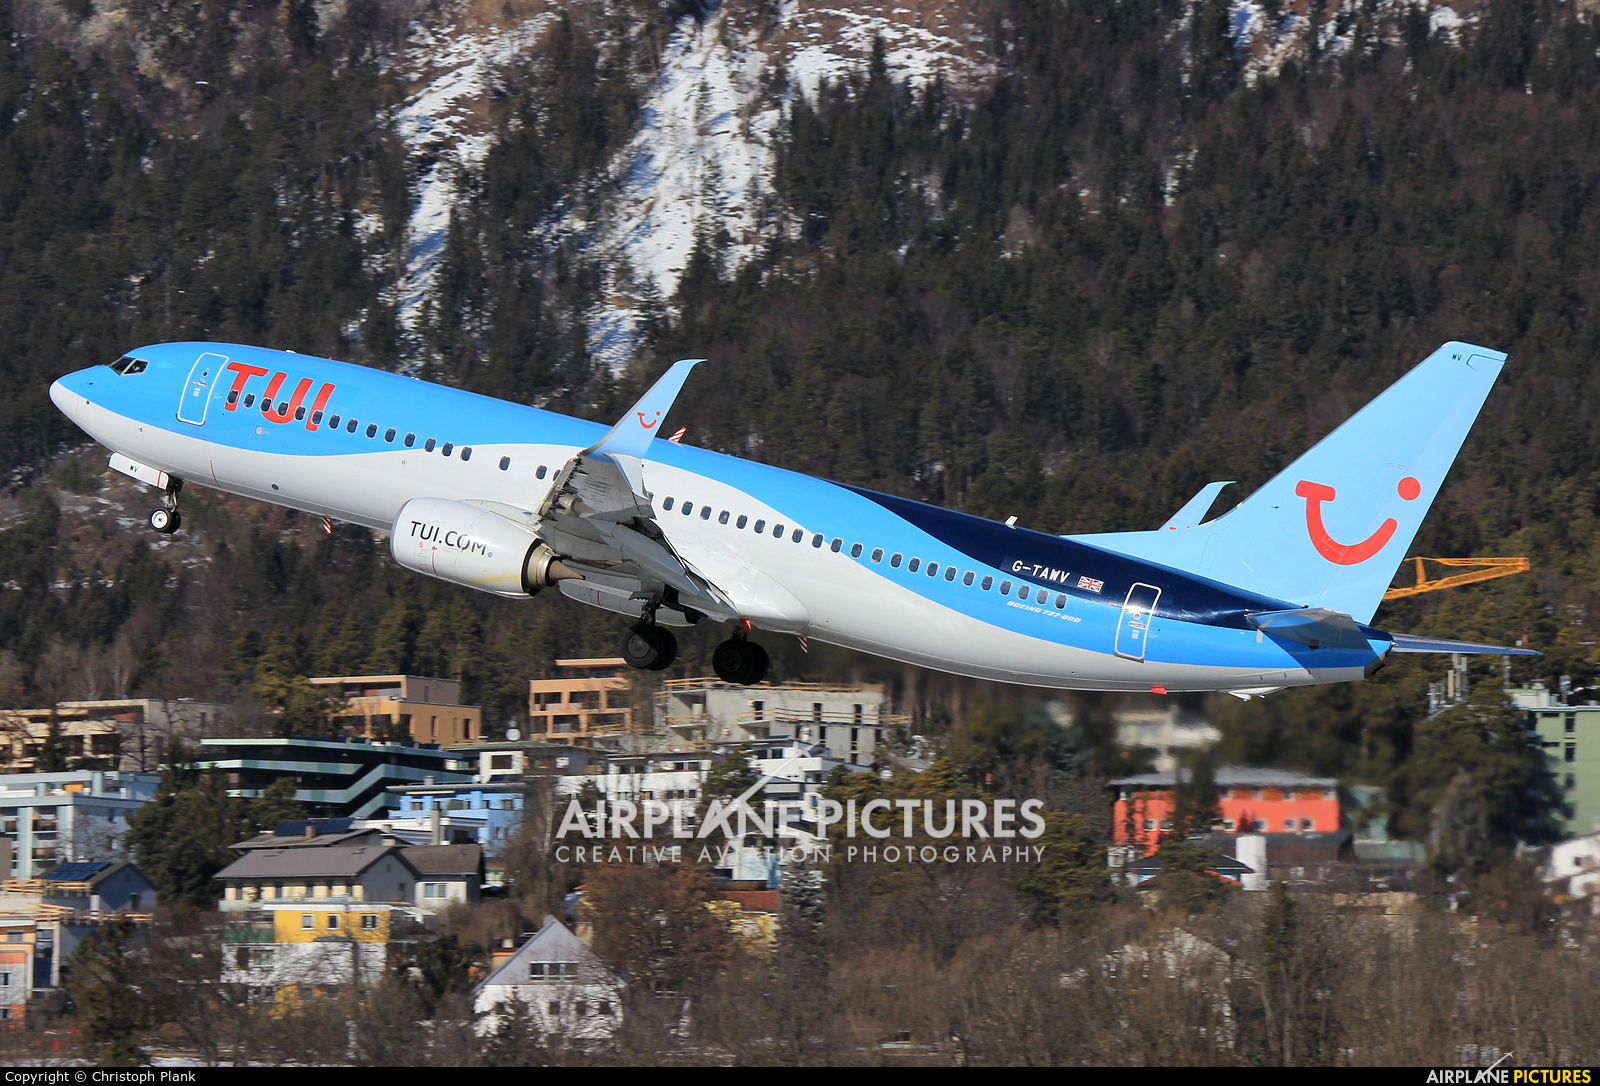 TUI Airways G-TAWV aircraft at Innsbruck